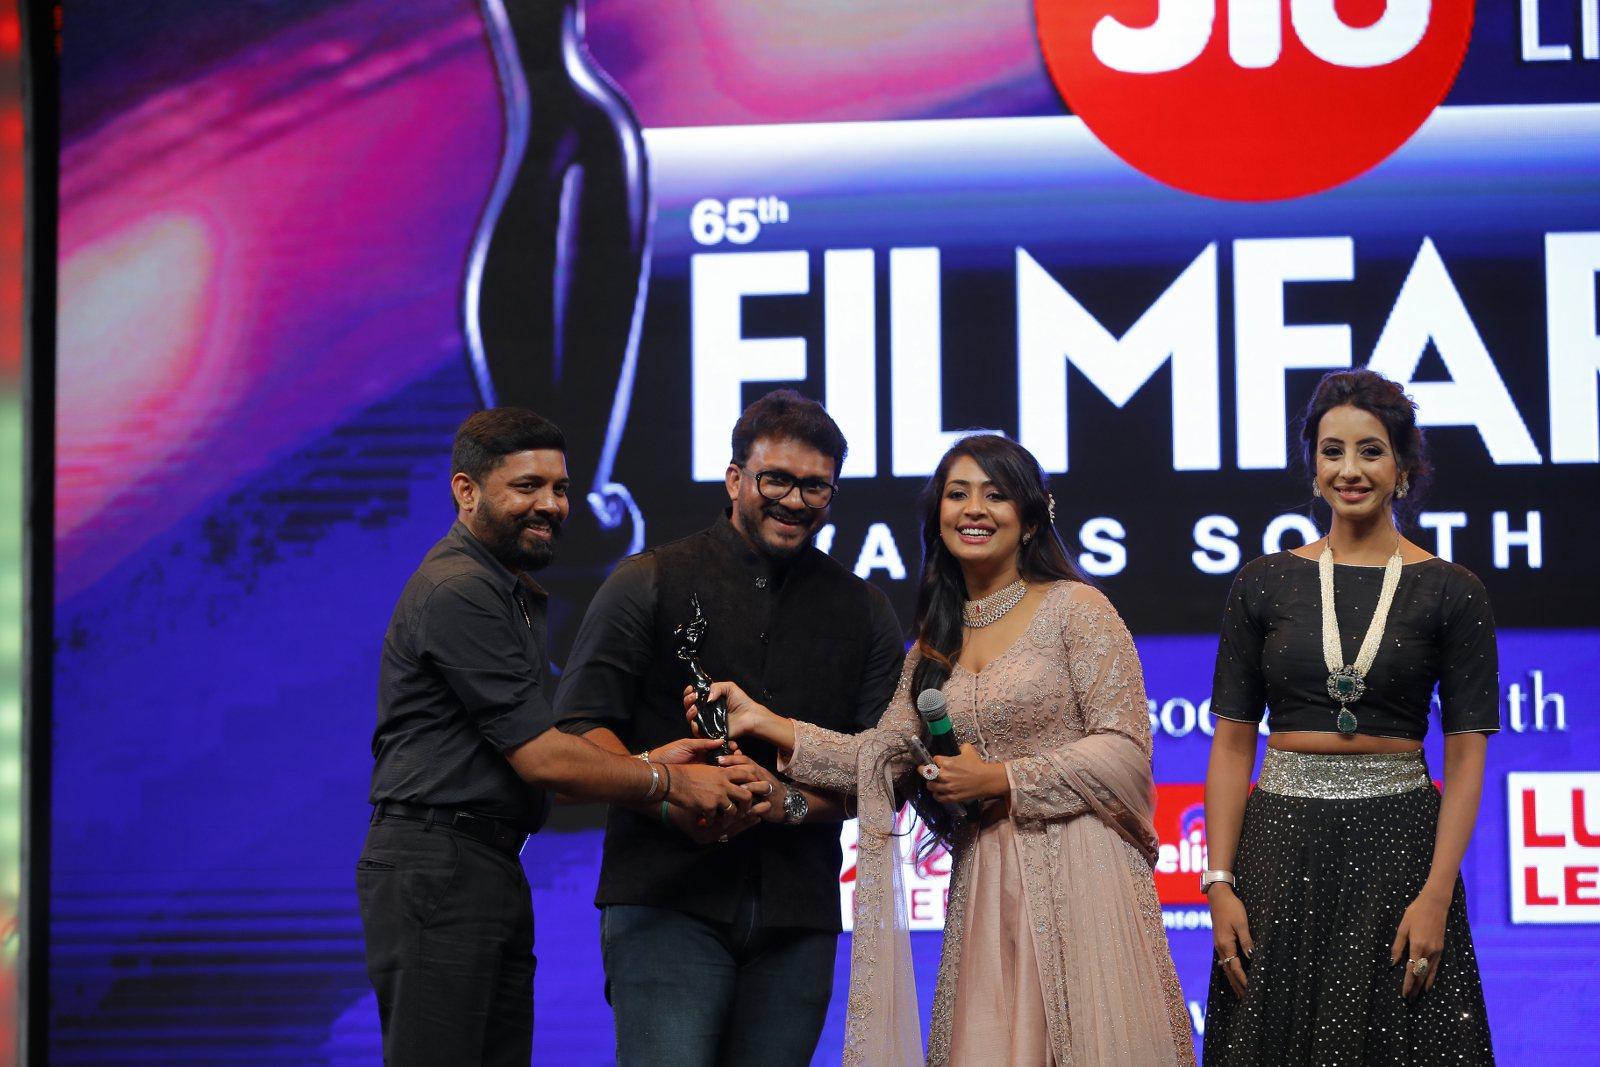 65th-jio-filmfare-awards-south-2018-photos-27 – TamilNext